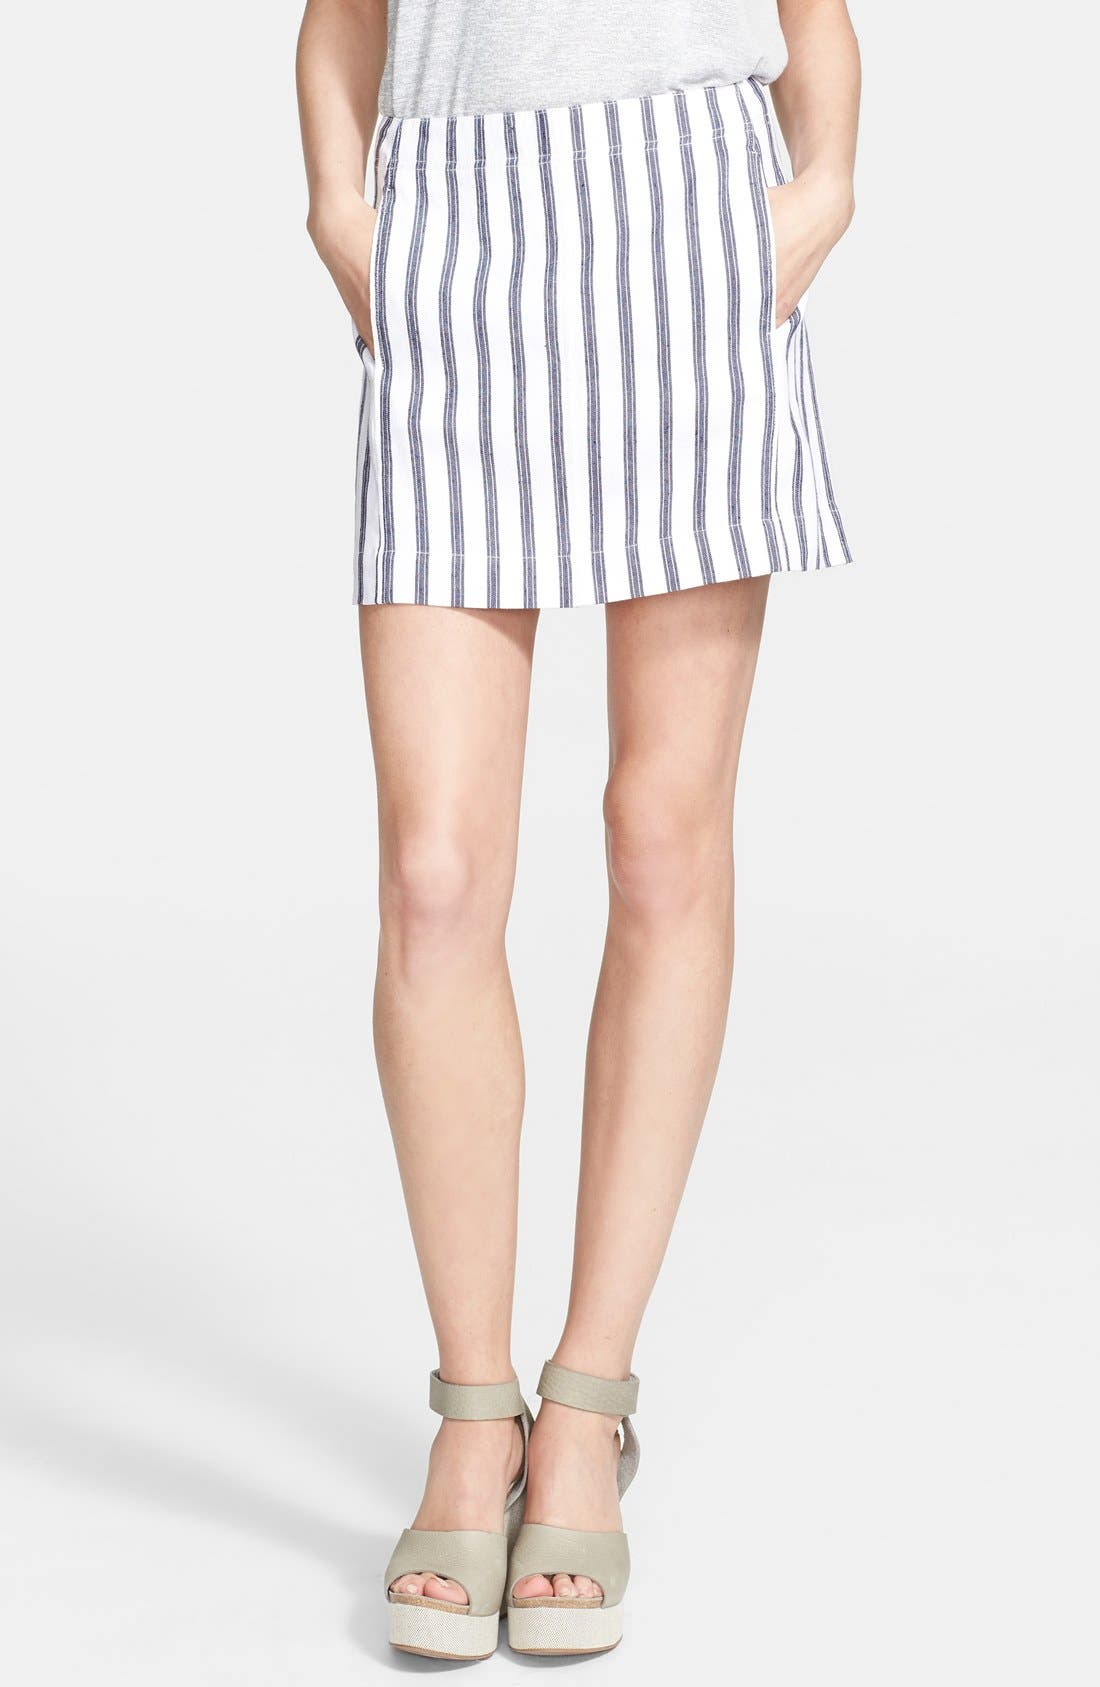 Alternate Image 1 Selected - Theory 'Matai' Stripe Skirt